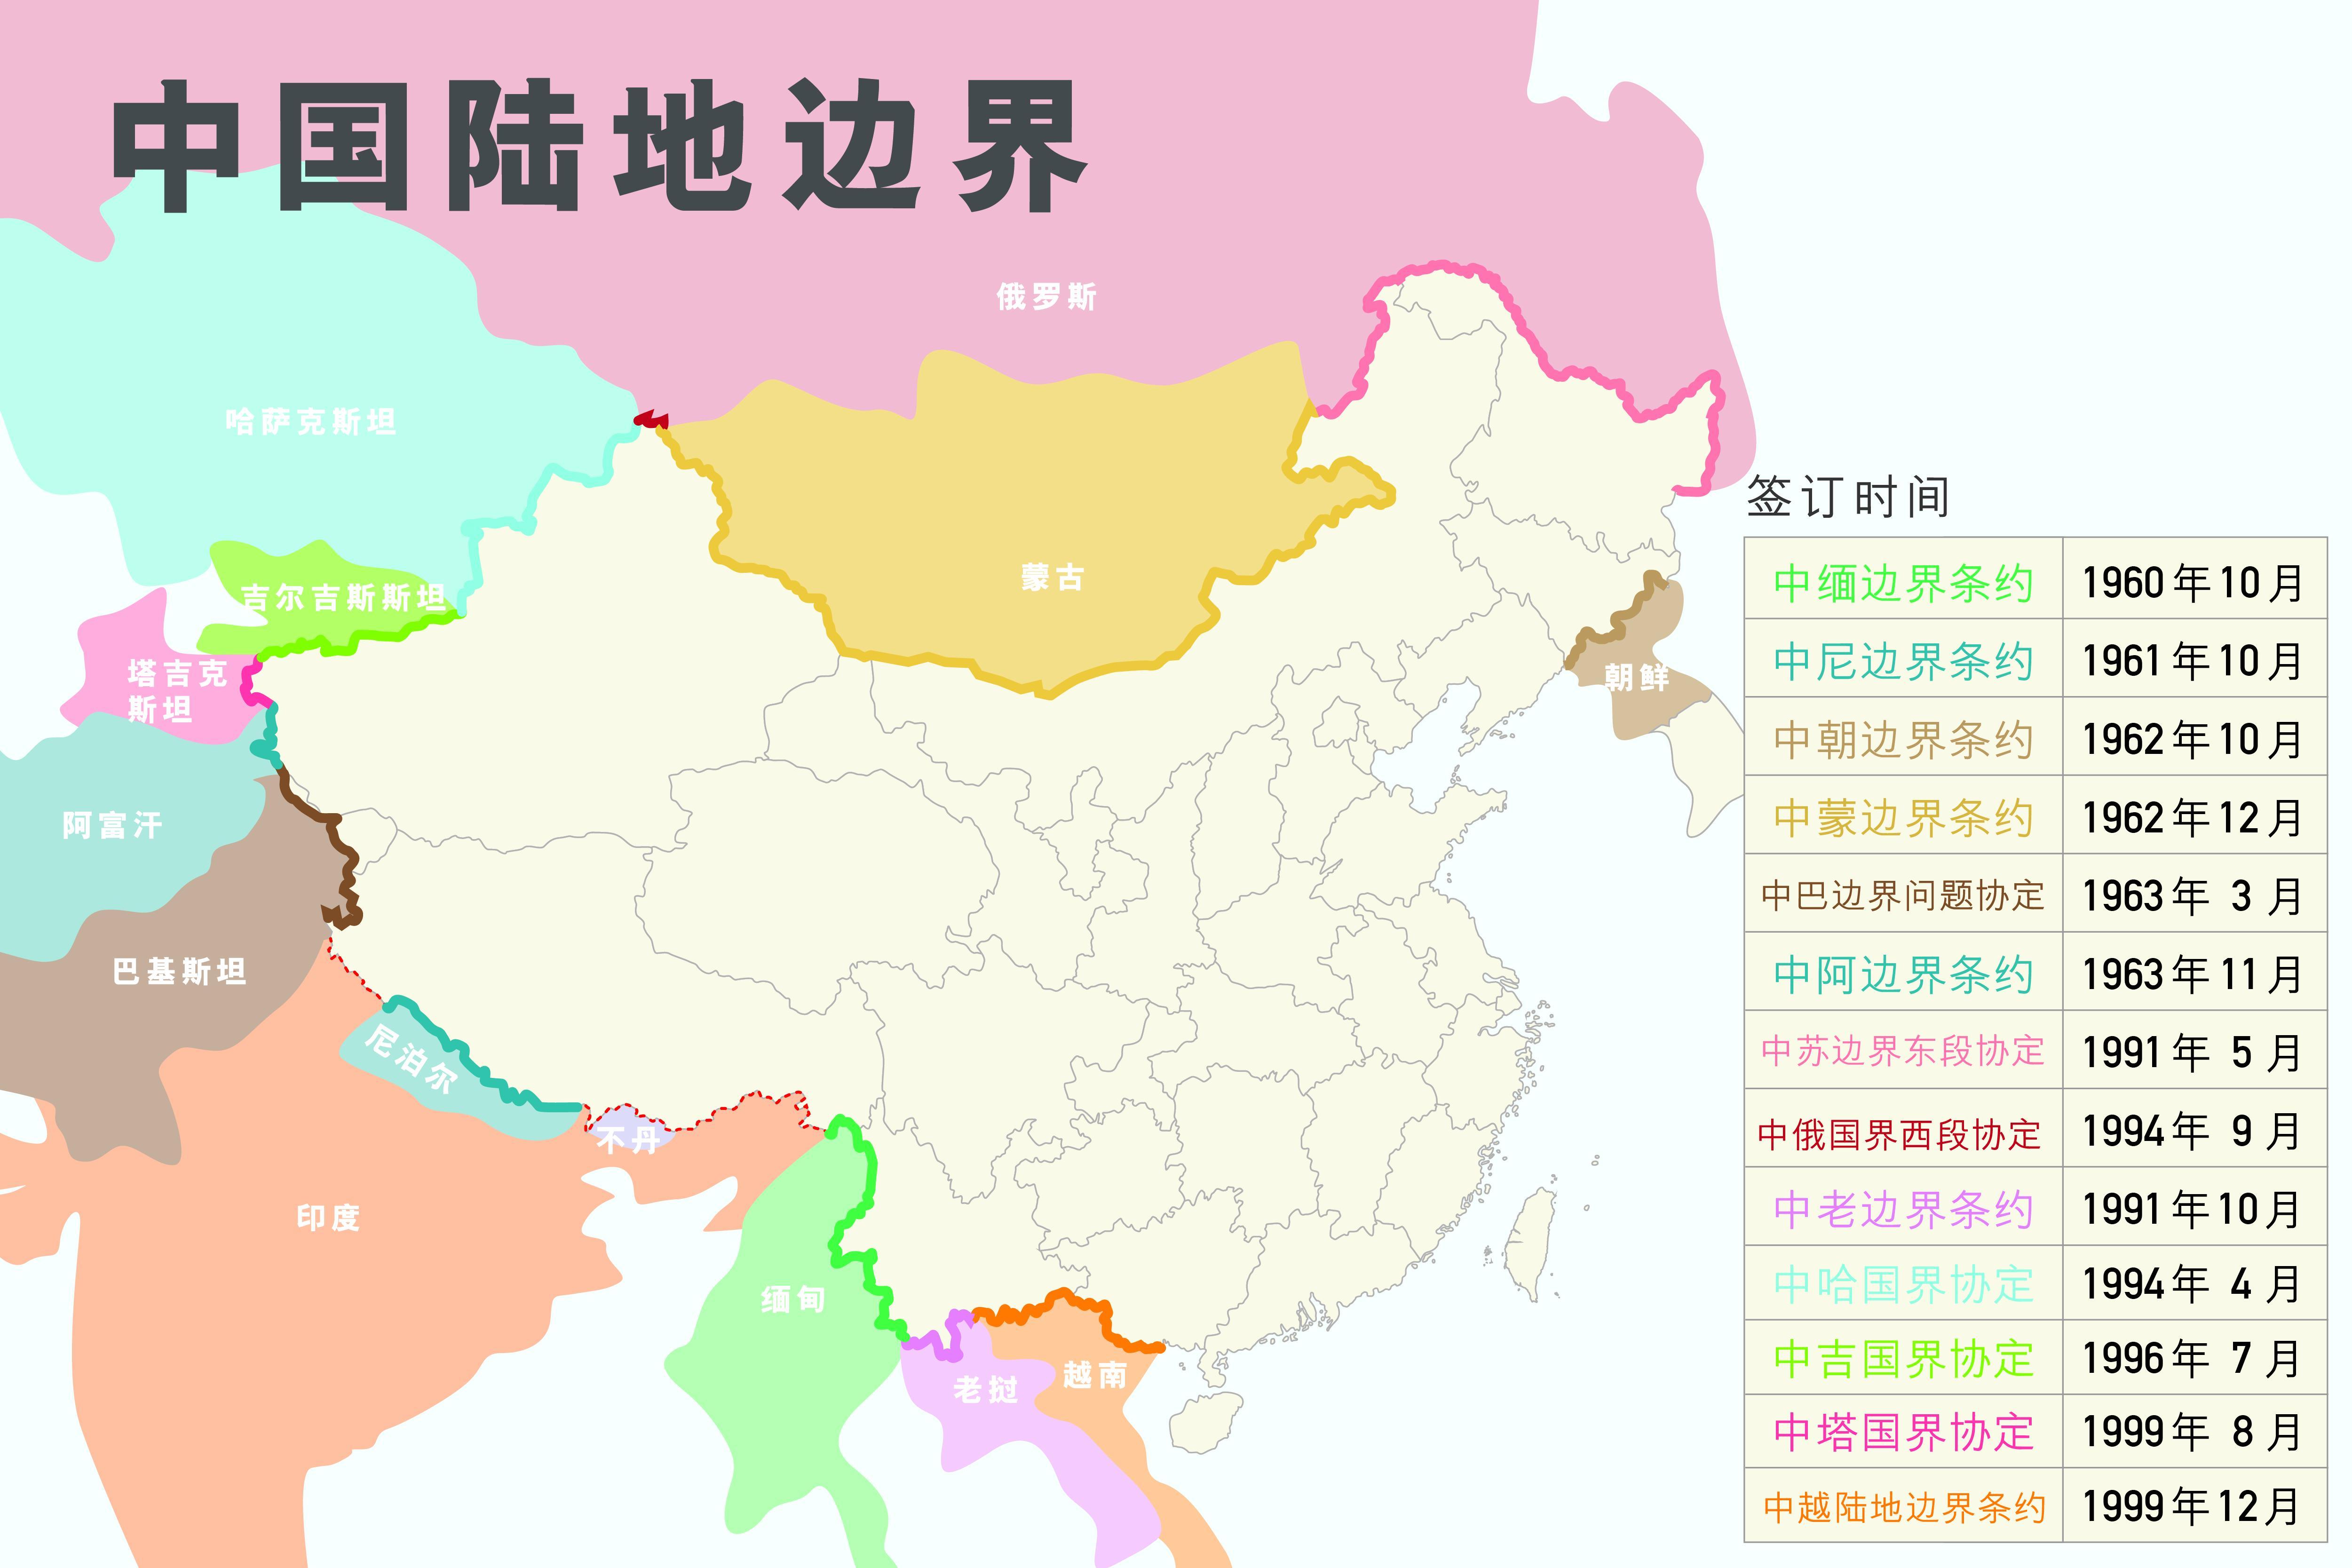 main_site_illustration_zhongguoludebianjie_v4-01